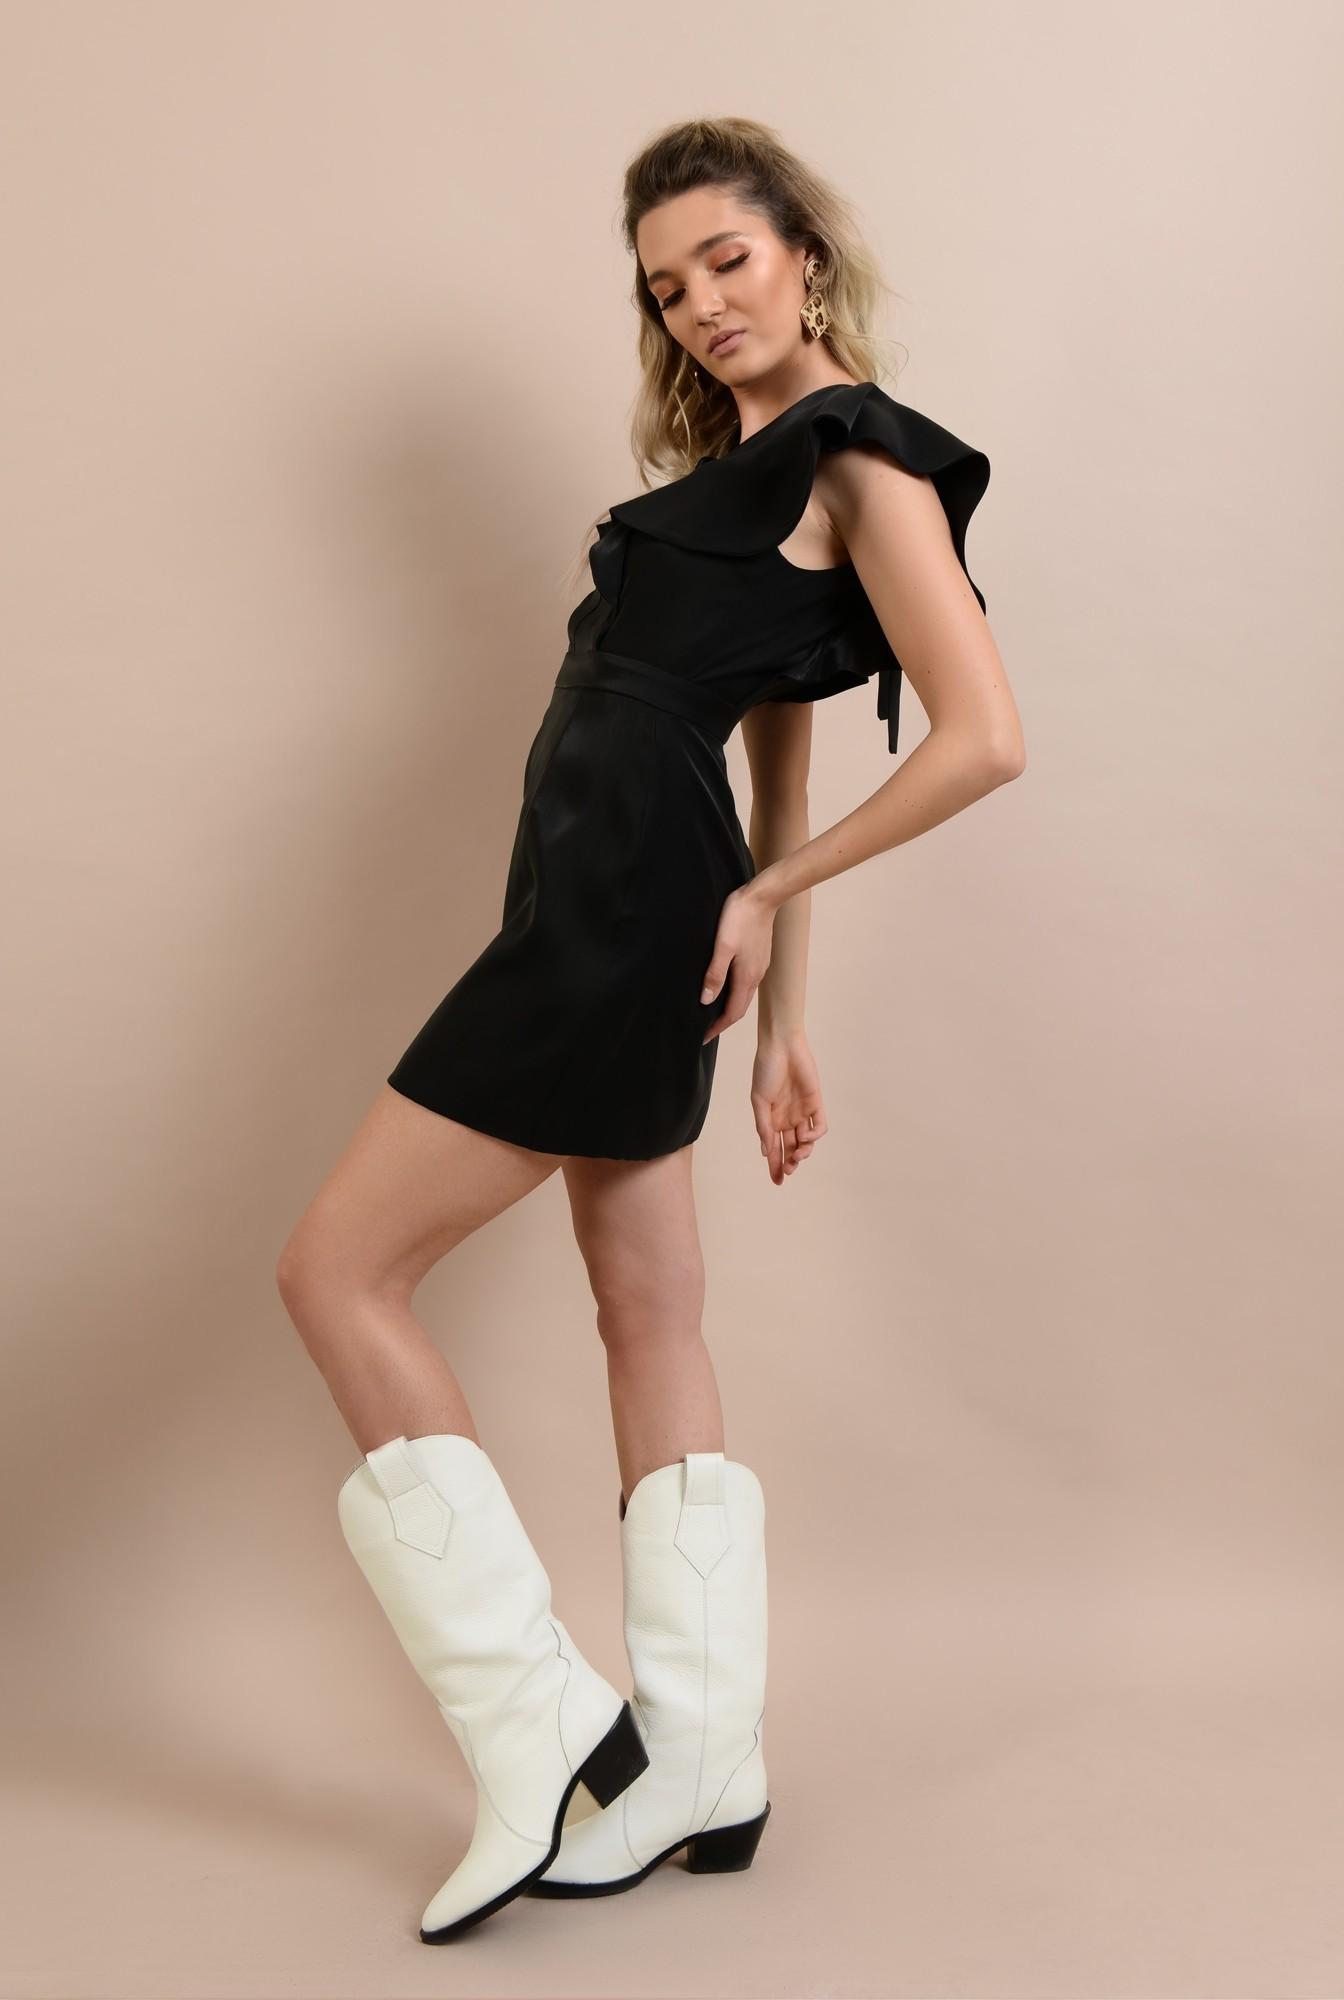 3 - rochie scurta, mini, cu volane, funda la spate, anchior